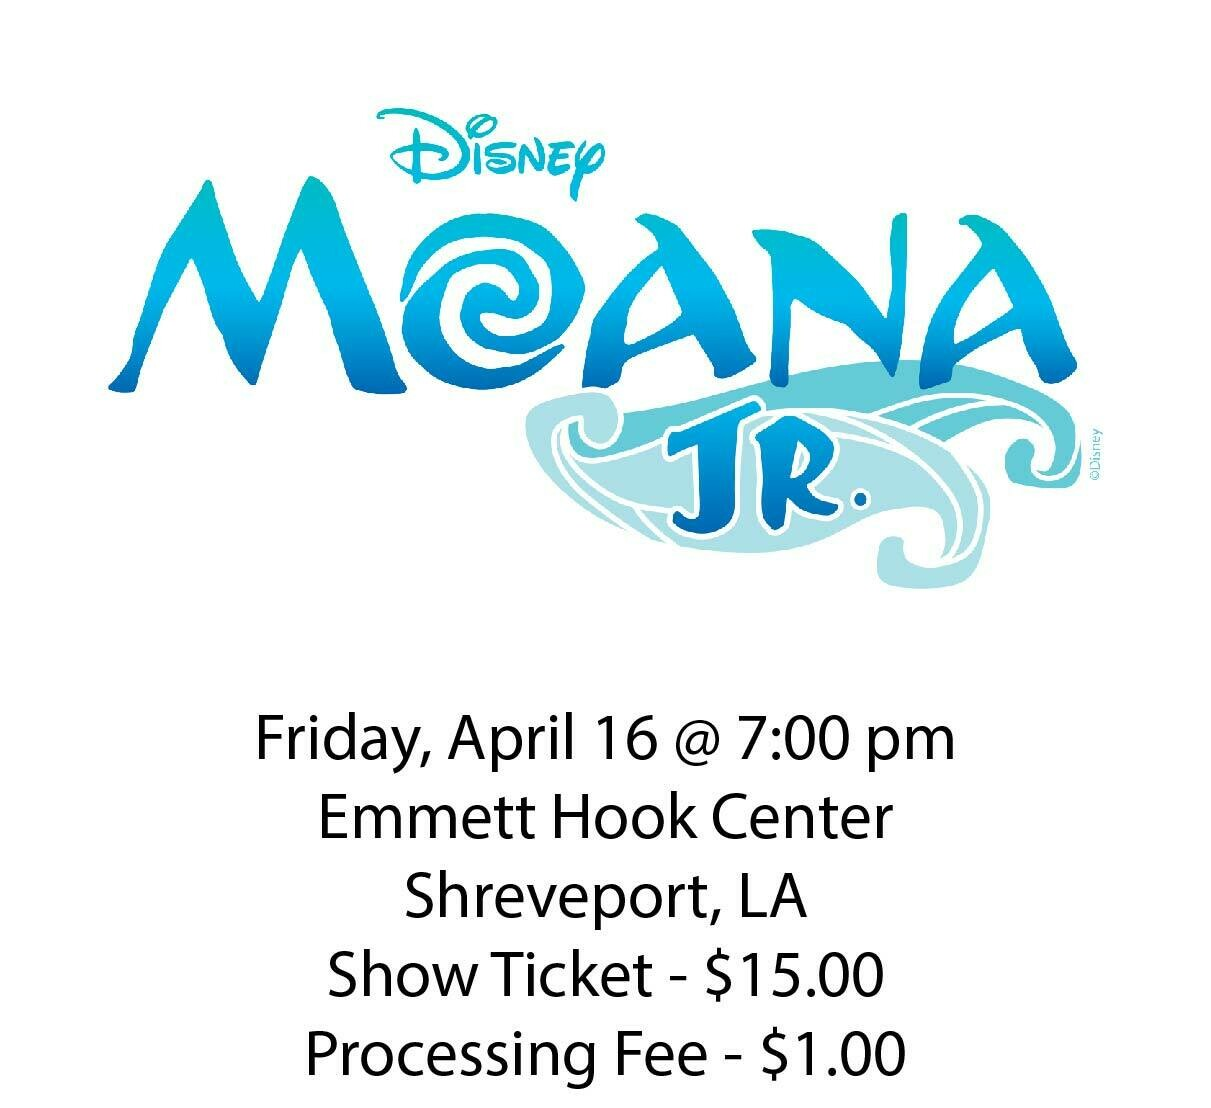 Disney's Moana JR., Friday April 16th @ 7:00 pm